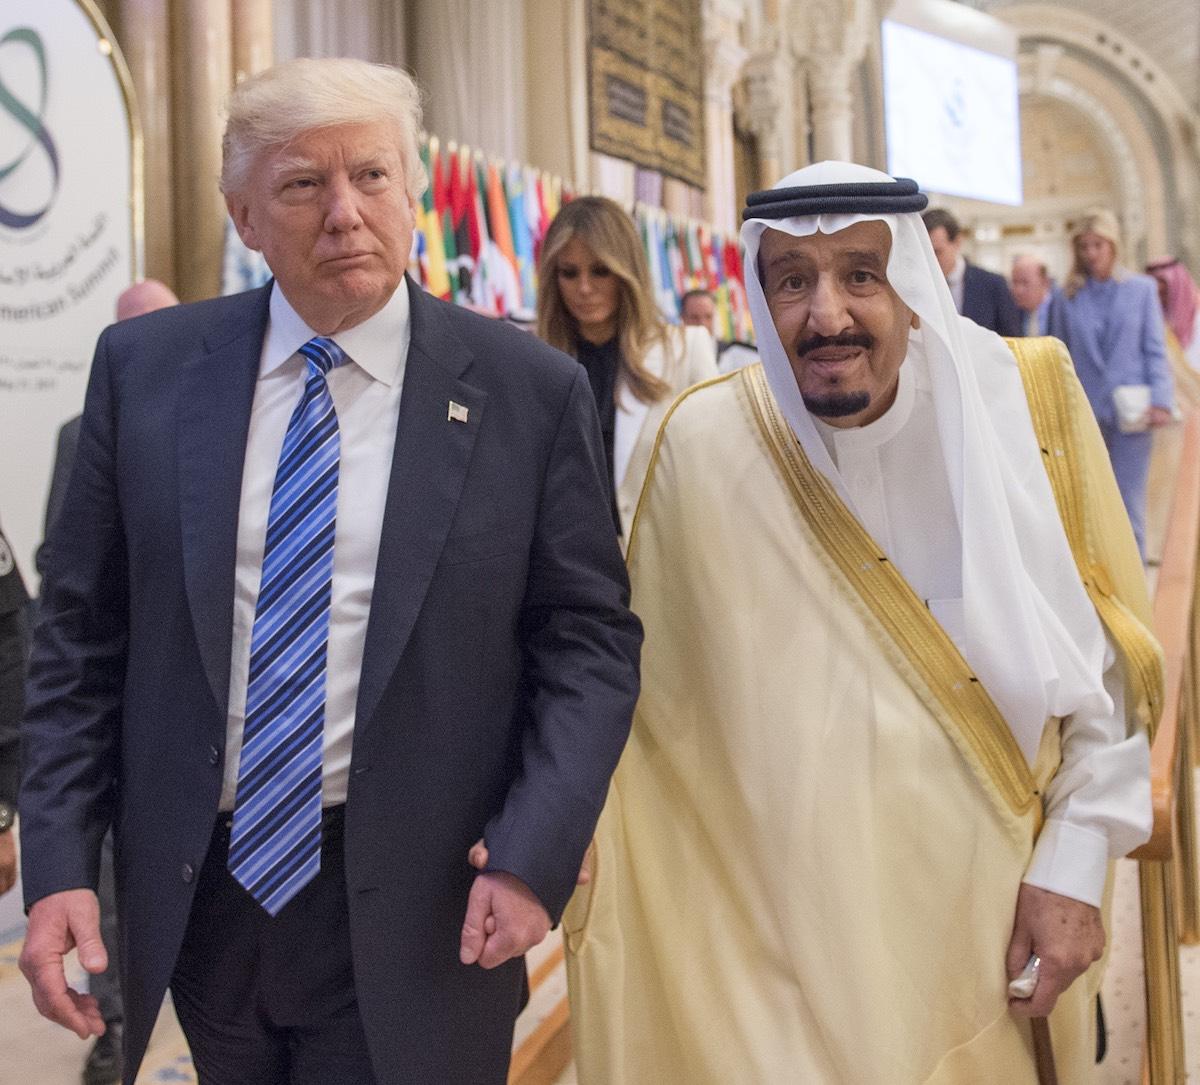 Ivanka Trump receives $134m women's fund donation from Saudi Arabia and UAE